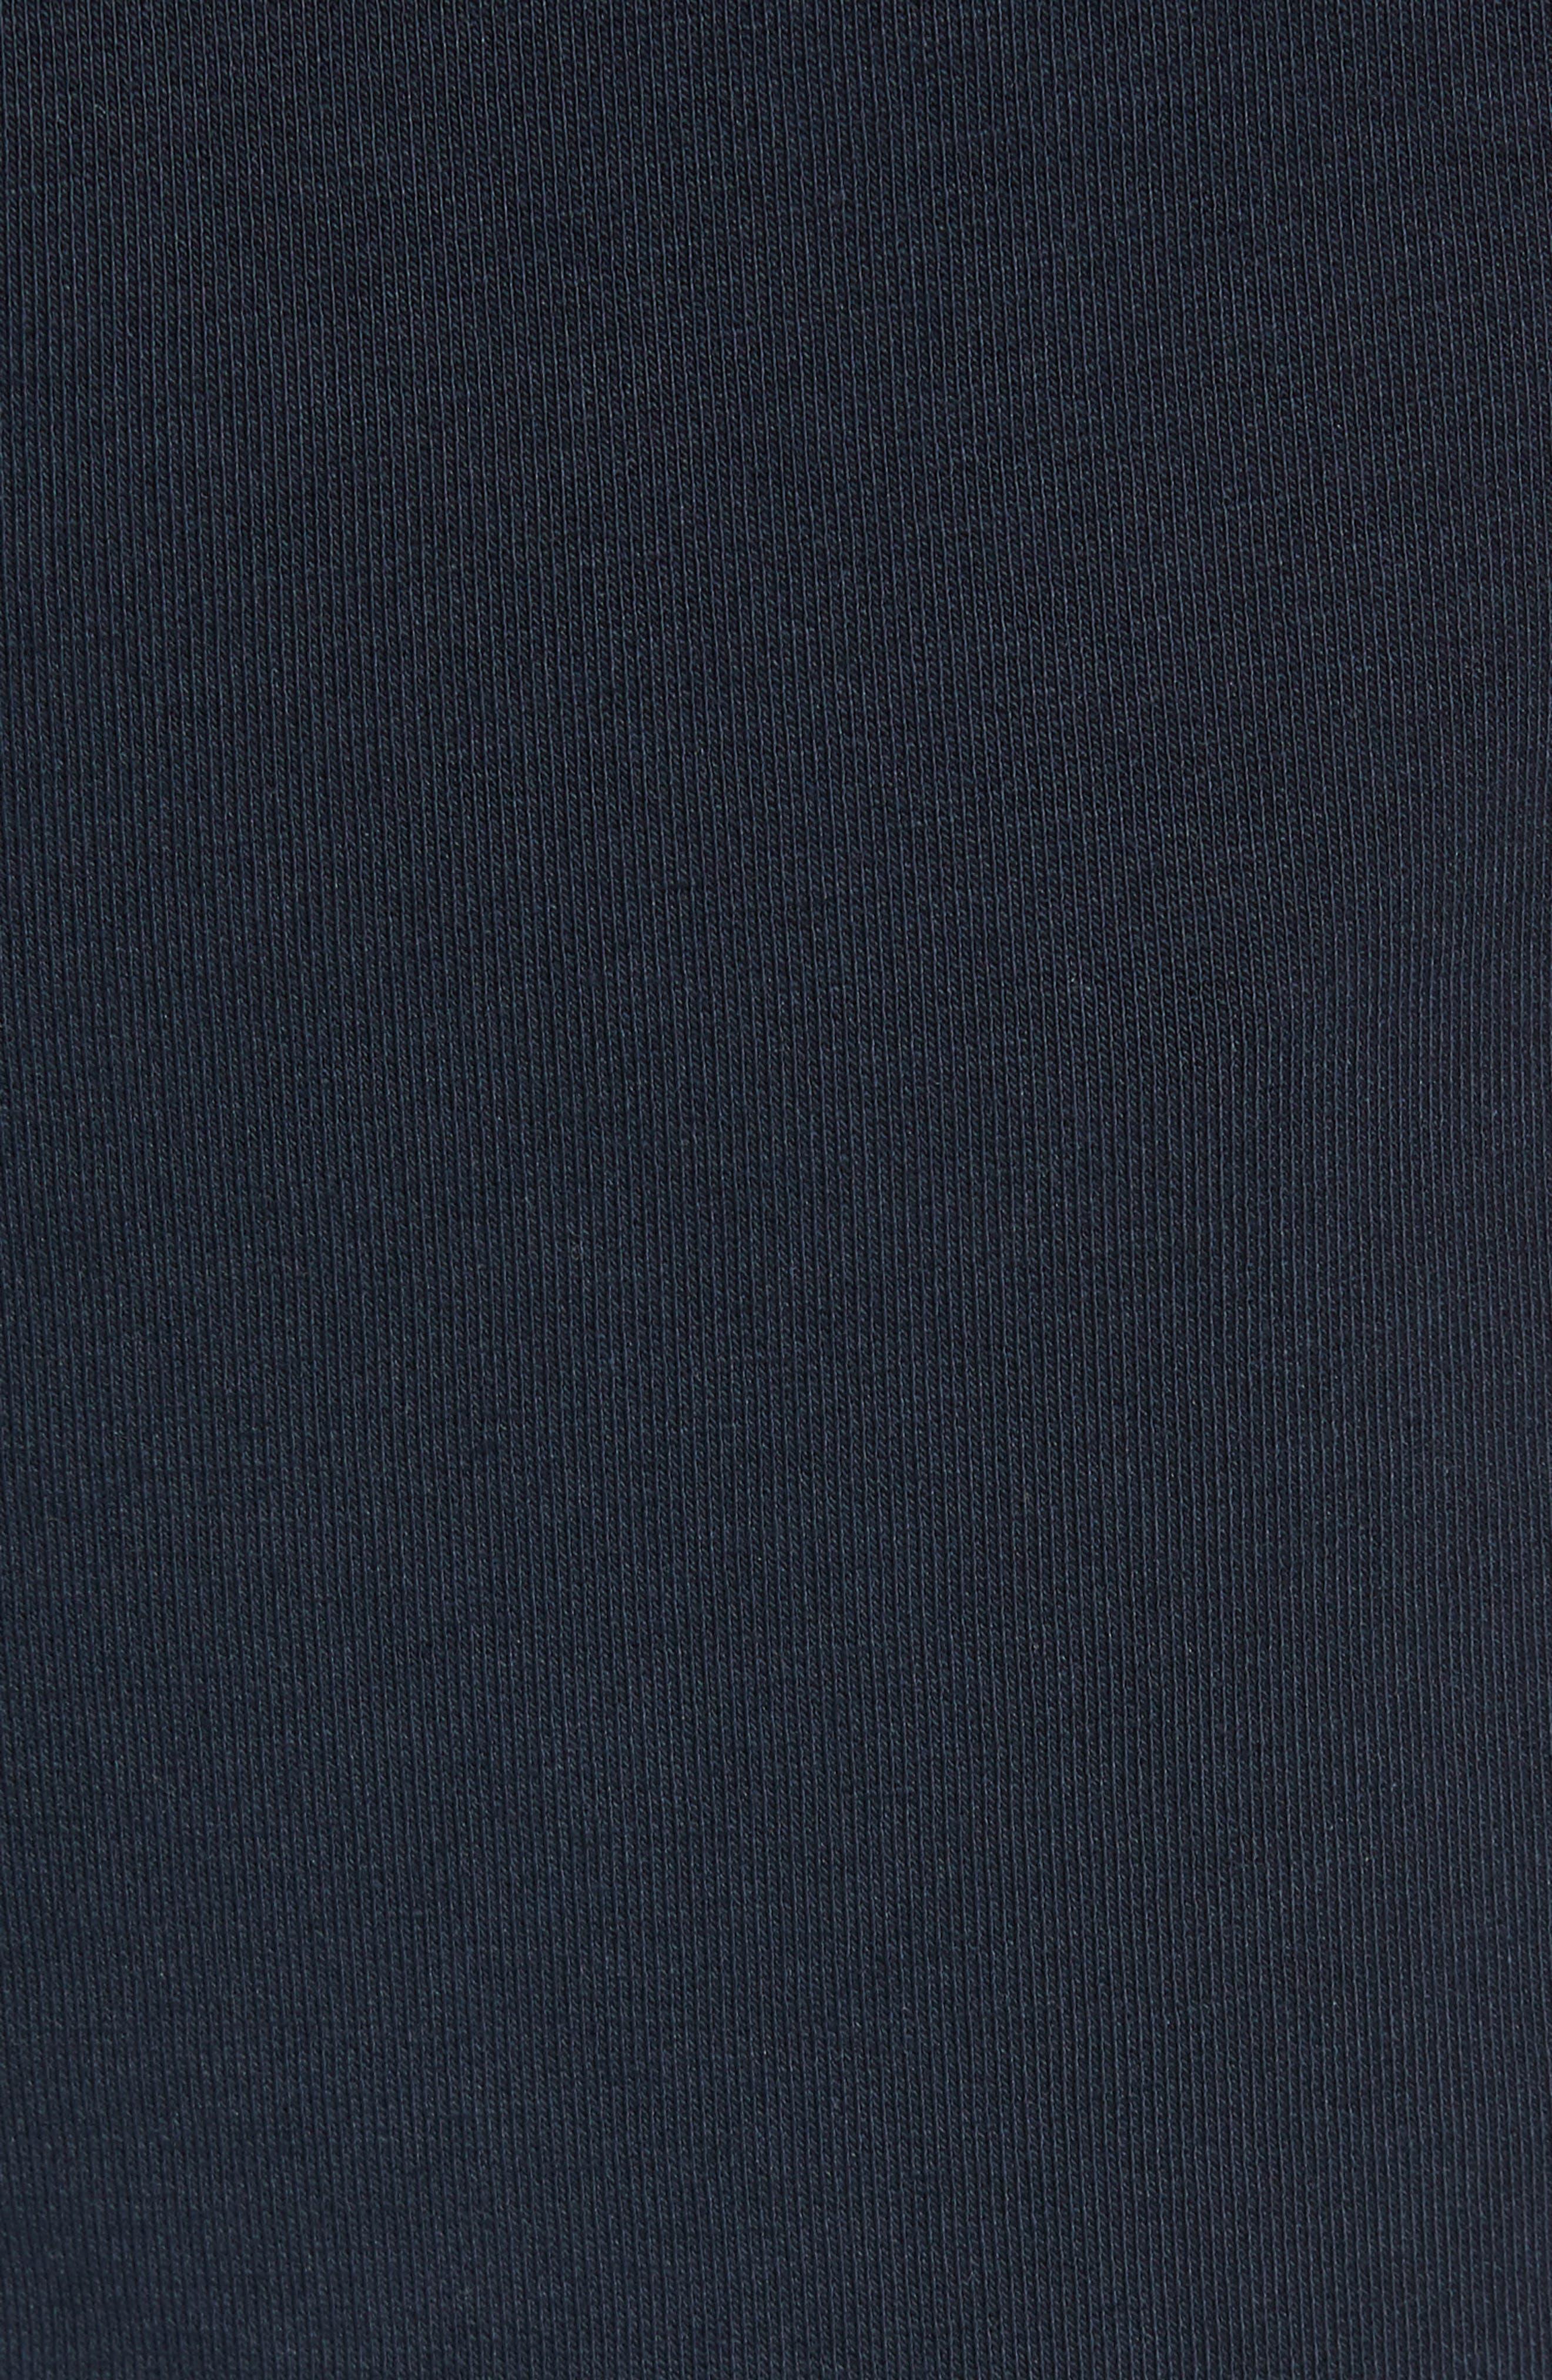 THEORY,                             Combo Tech Regular Fit Jogger Pants,                             Alternate thumbnail 5, color,                             497